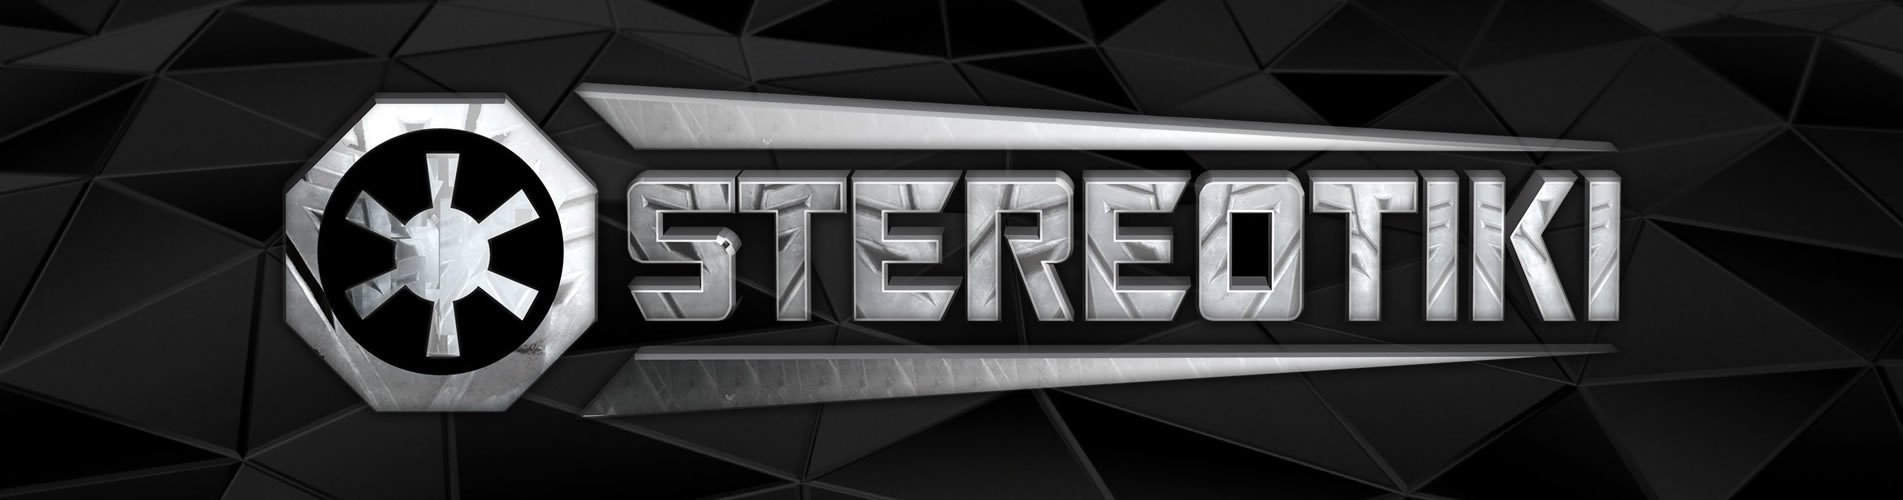 Stereotiki Banner 1 - Logo